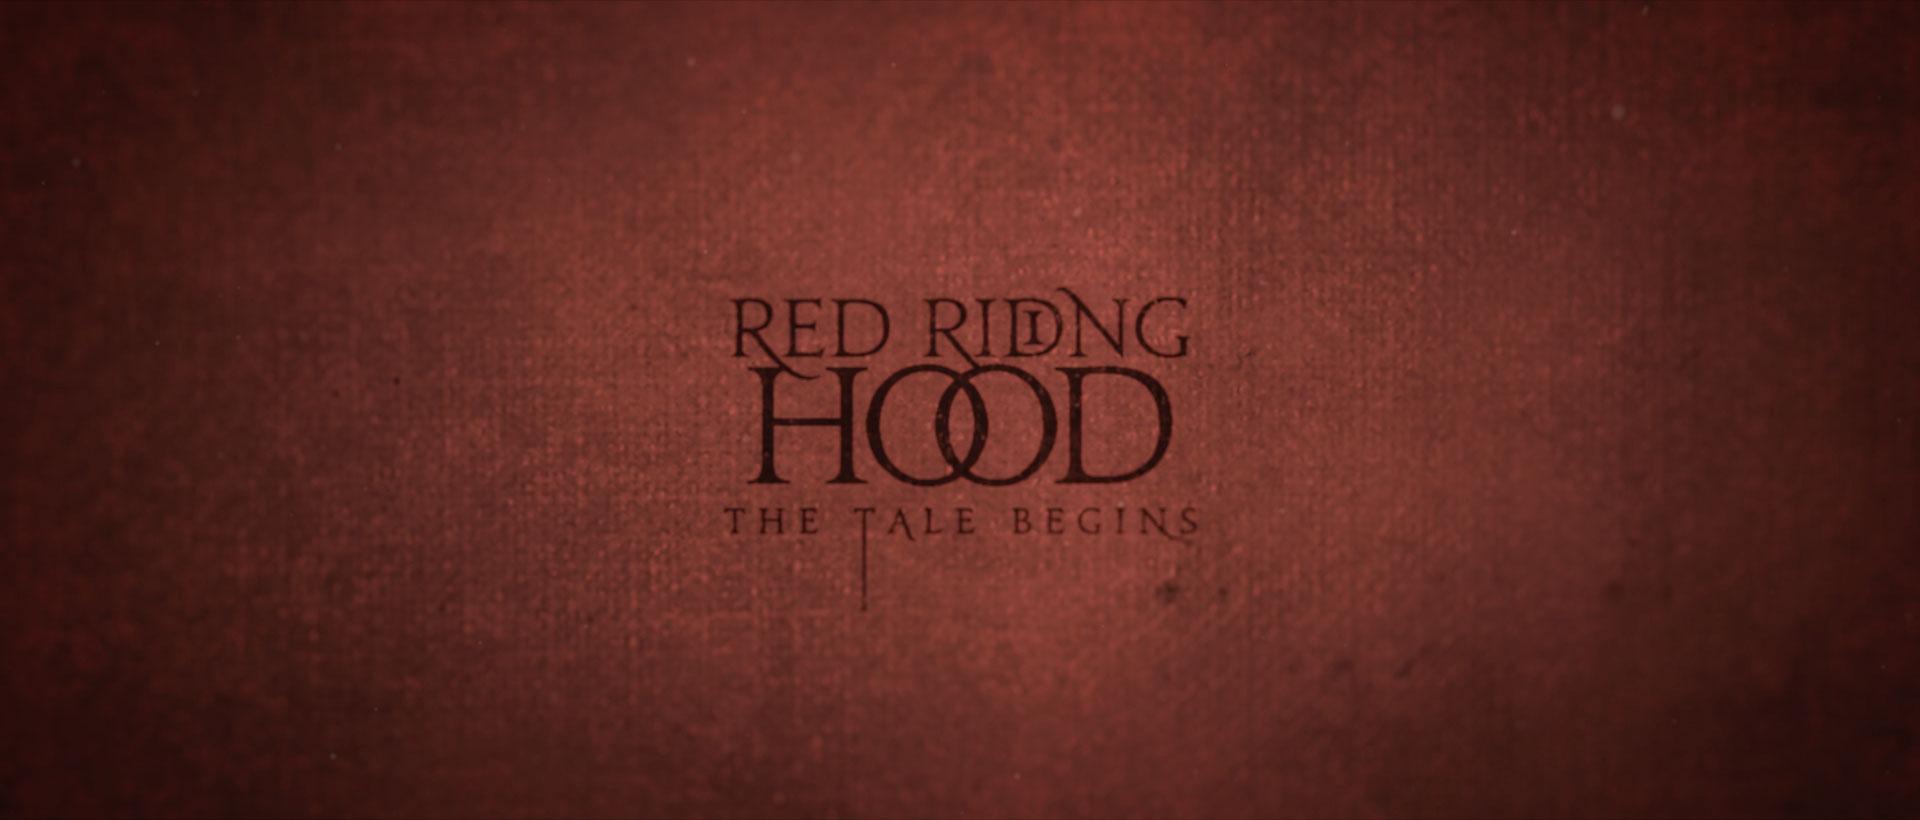 RedRidingHood_1_Cropped_J60.jpg